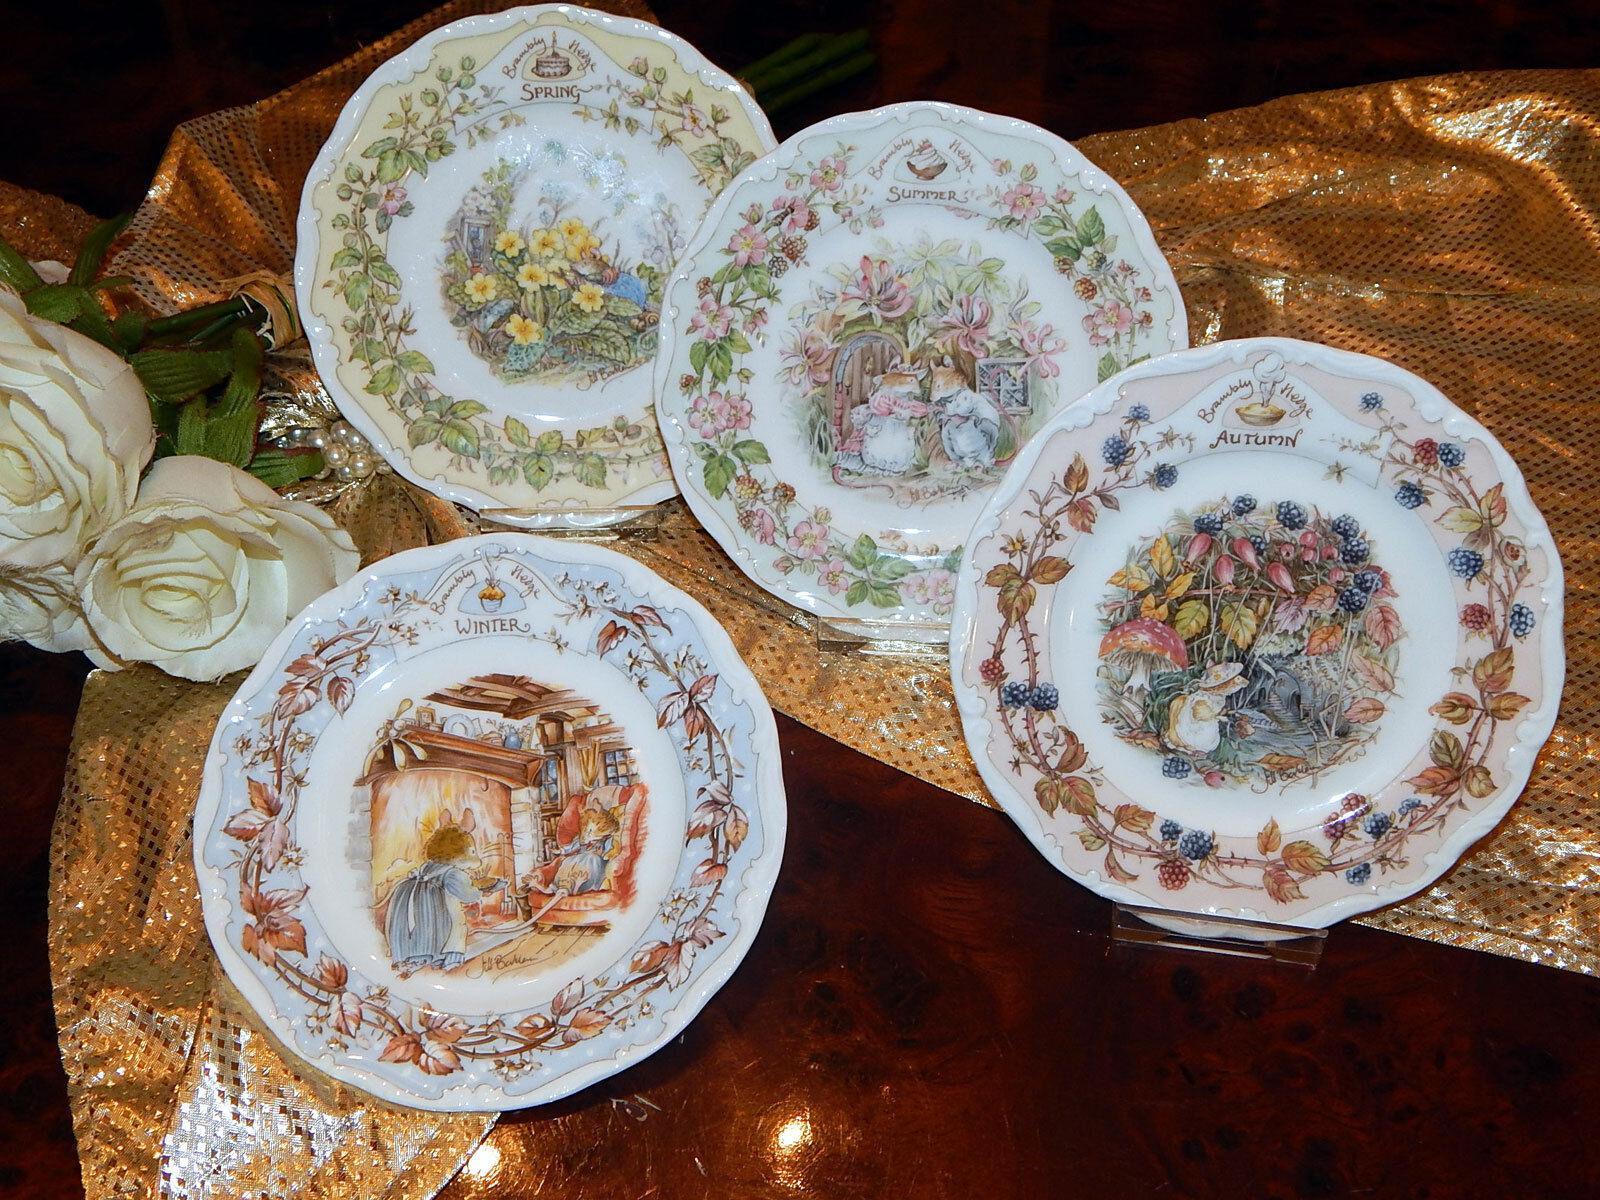 4 Teller Tea Plate 16 cm Brambly Hedge Hedge Hedge Jill Barklem 4 Jahreszeiten neu c389b1